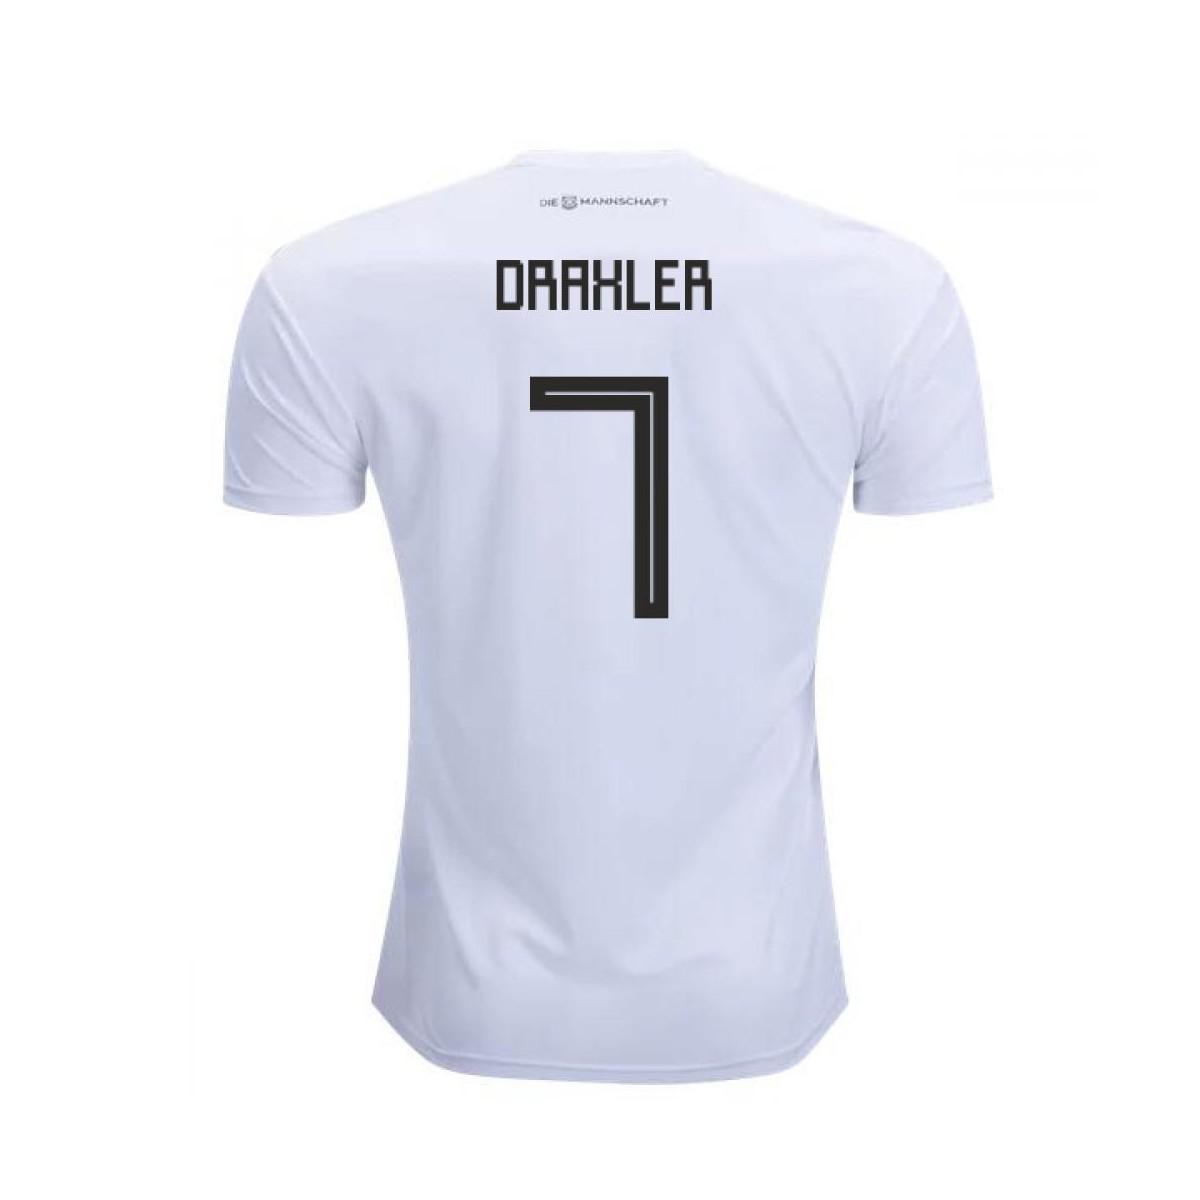 67580e7ff10 Adidas 2018-2019 Germany Home Football Shirt (draxler 7) Women s T ...